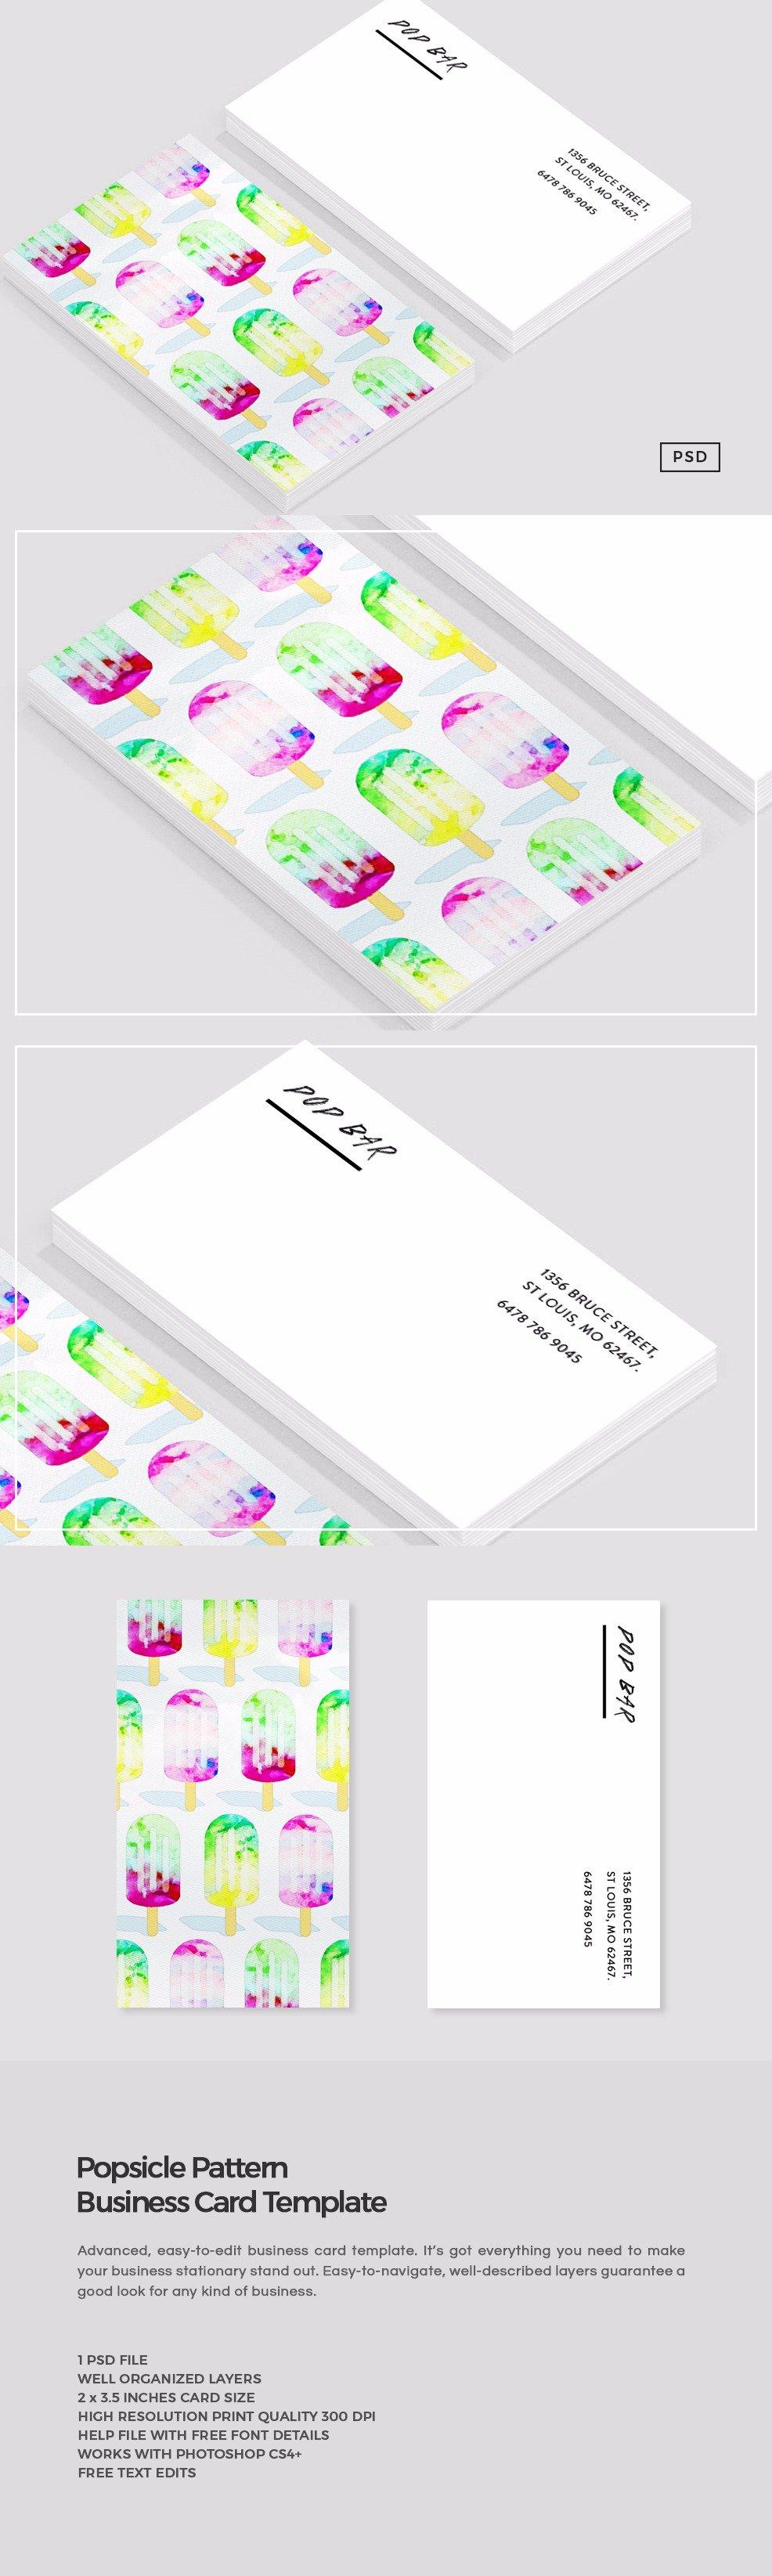 Business cards in photoshop cs4 choice image card design and card business card templates photoshop cs4 choice image card design and famous how to print business card colourmoves